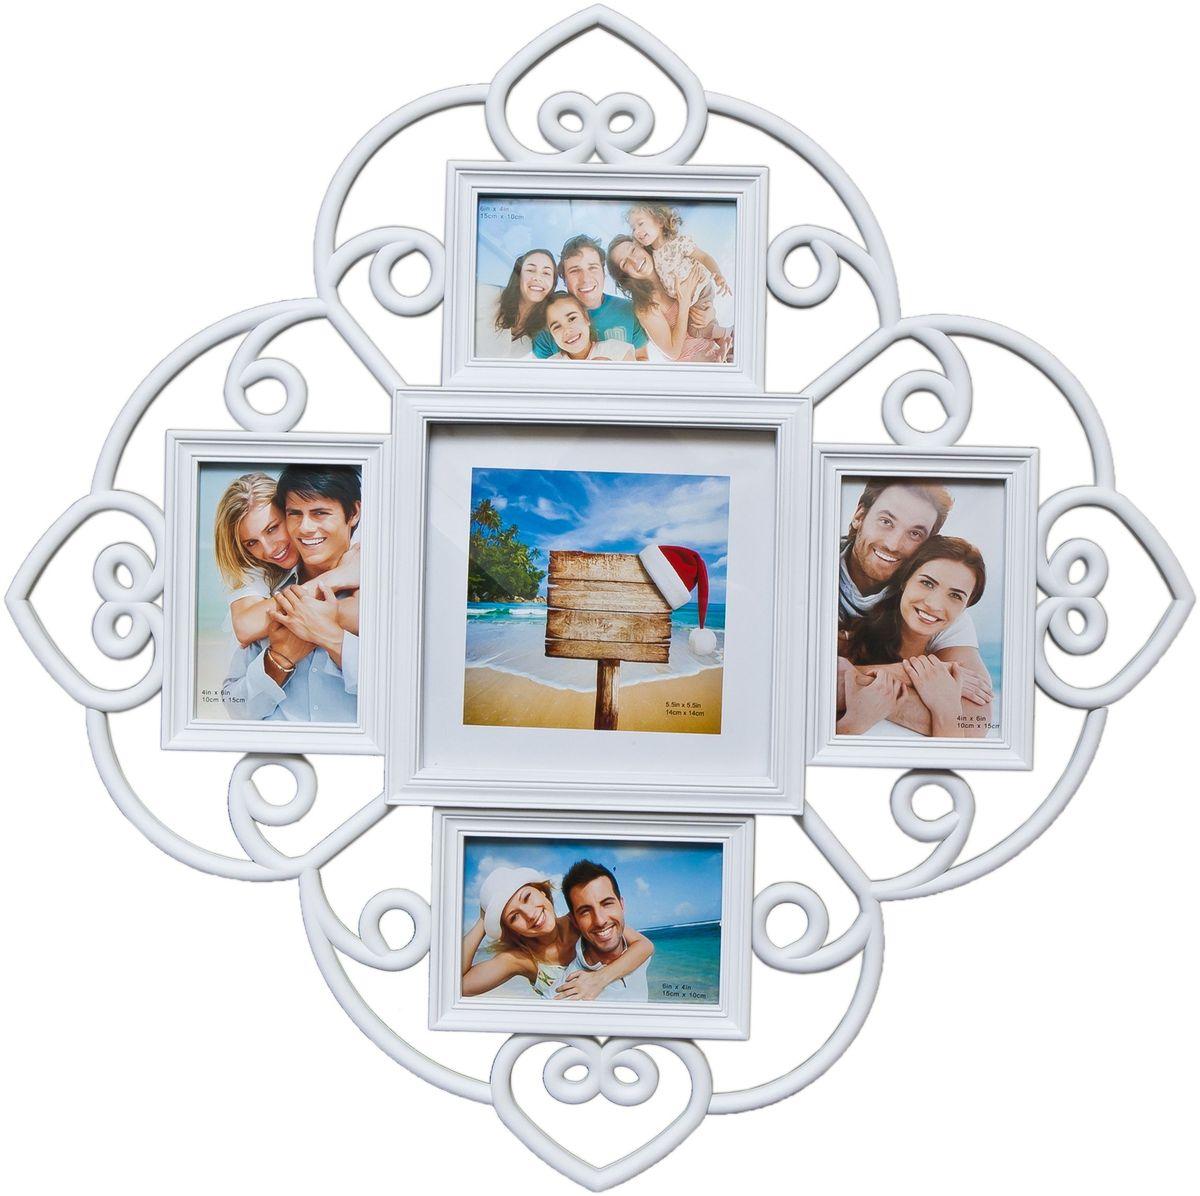 Коллаж Platinum, цвет: белый, 5 фоторамок. BH-1405PLATINUM BH-1405-White-БелыйПластиковый коллаж с 4 фото 10х15 см, 1 фото 14х14 см.